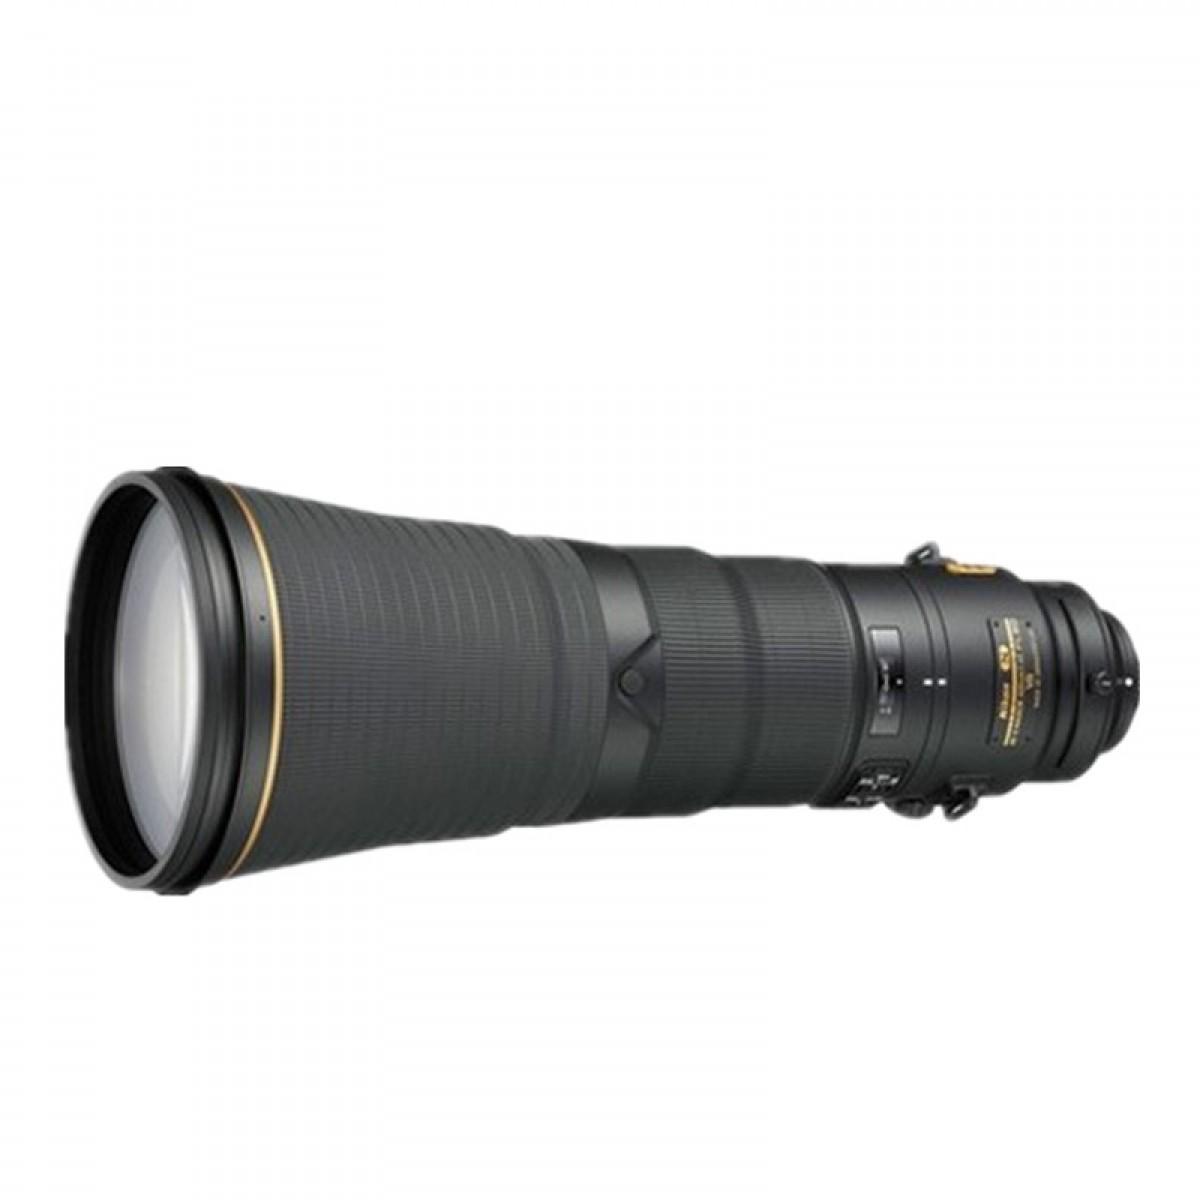 Nikon/尼康AF-S 600mm F/4E FL ED VR国行正品远摄长焦定焦镜头